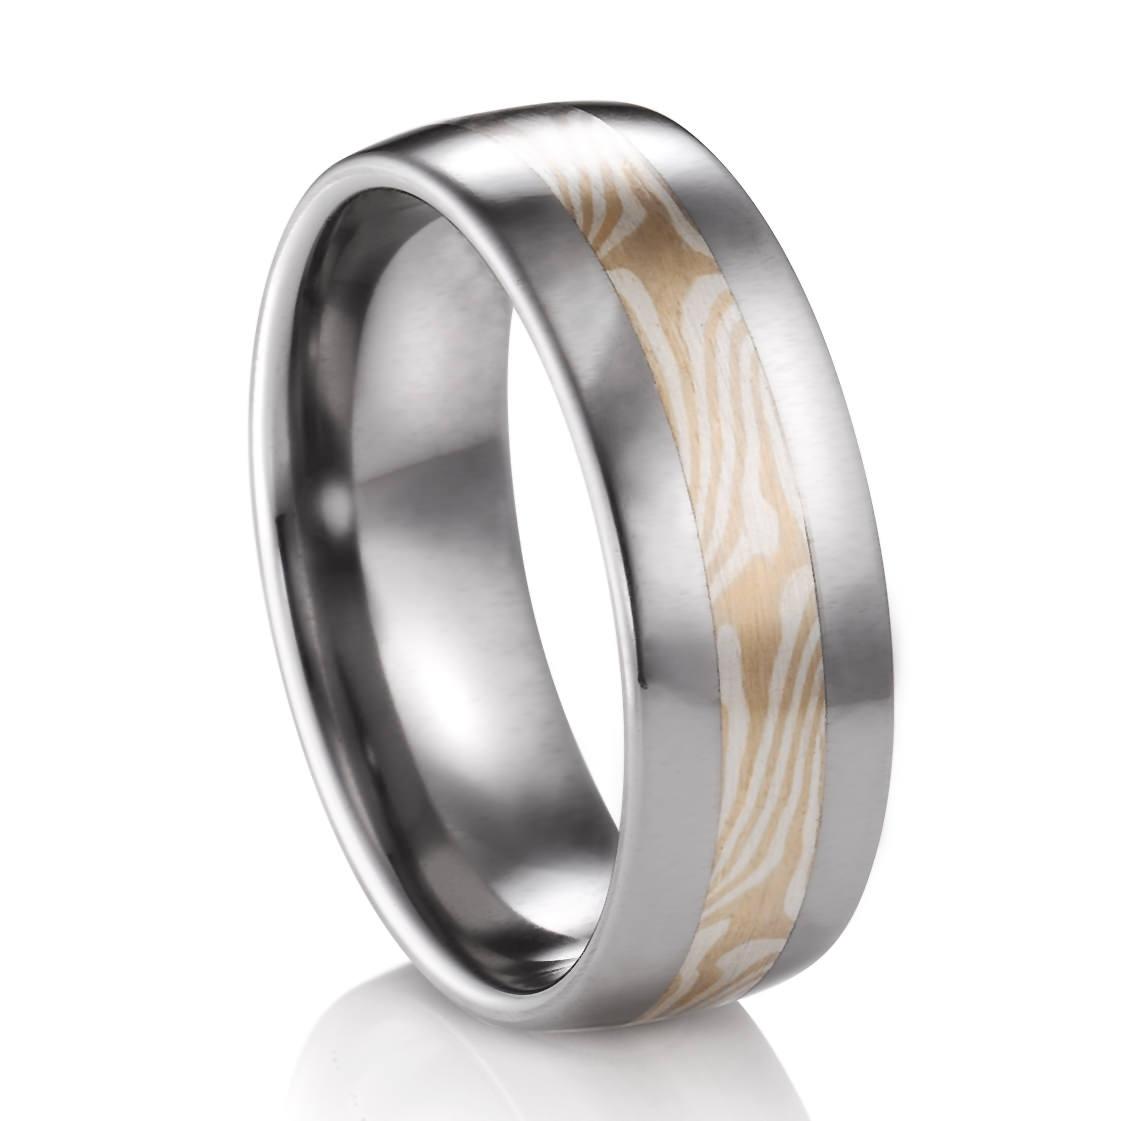 Mokume Gane Titanium Ring – Mens Wedding Bands Throughout Mokume Gane Wedding Bands (View 11 of 15)